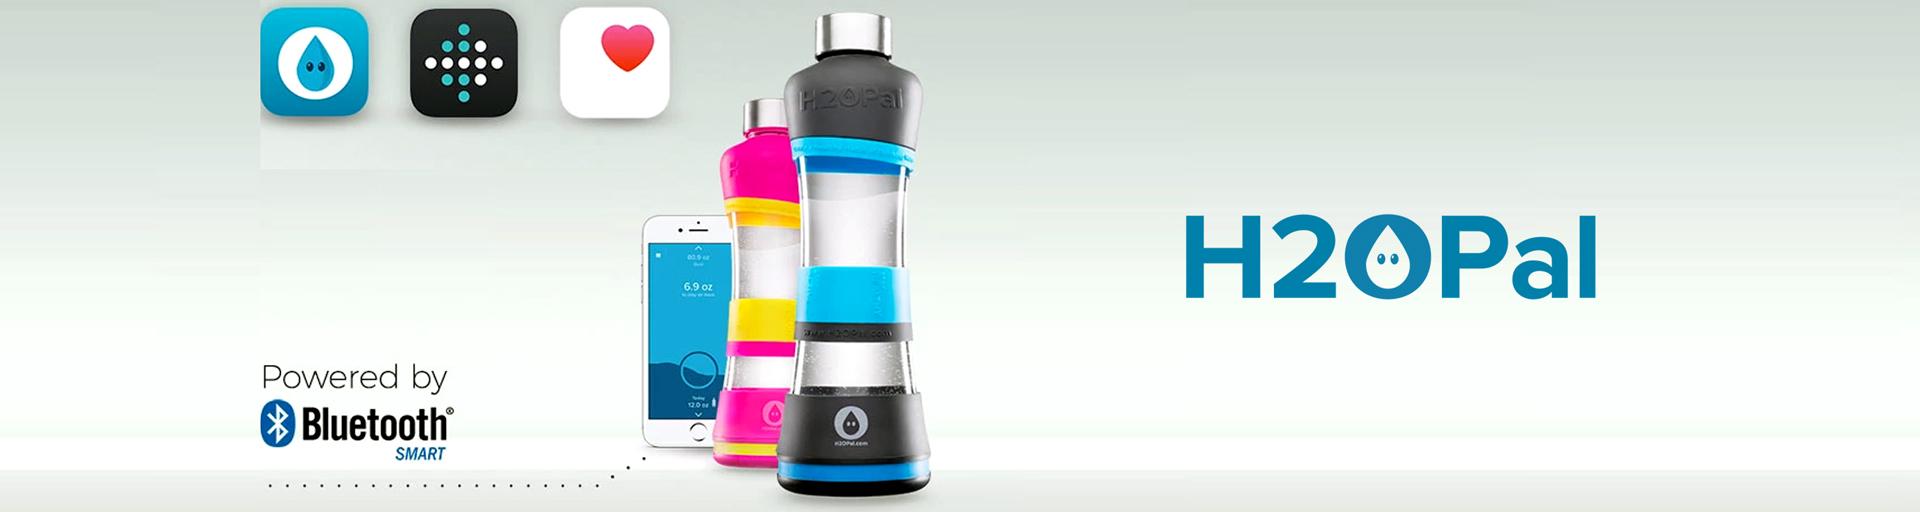 H2OPal